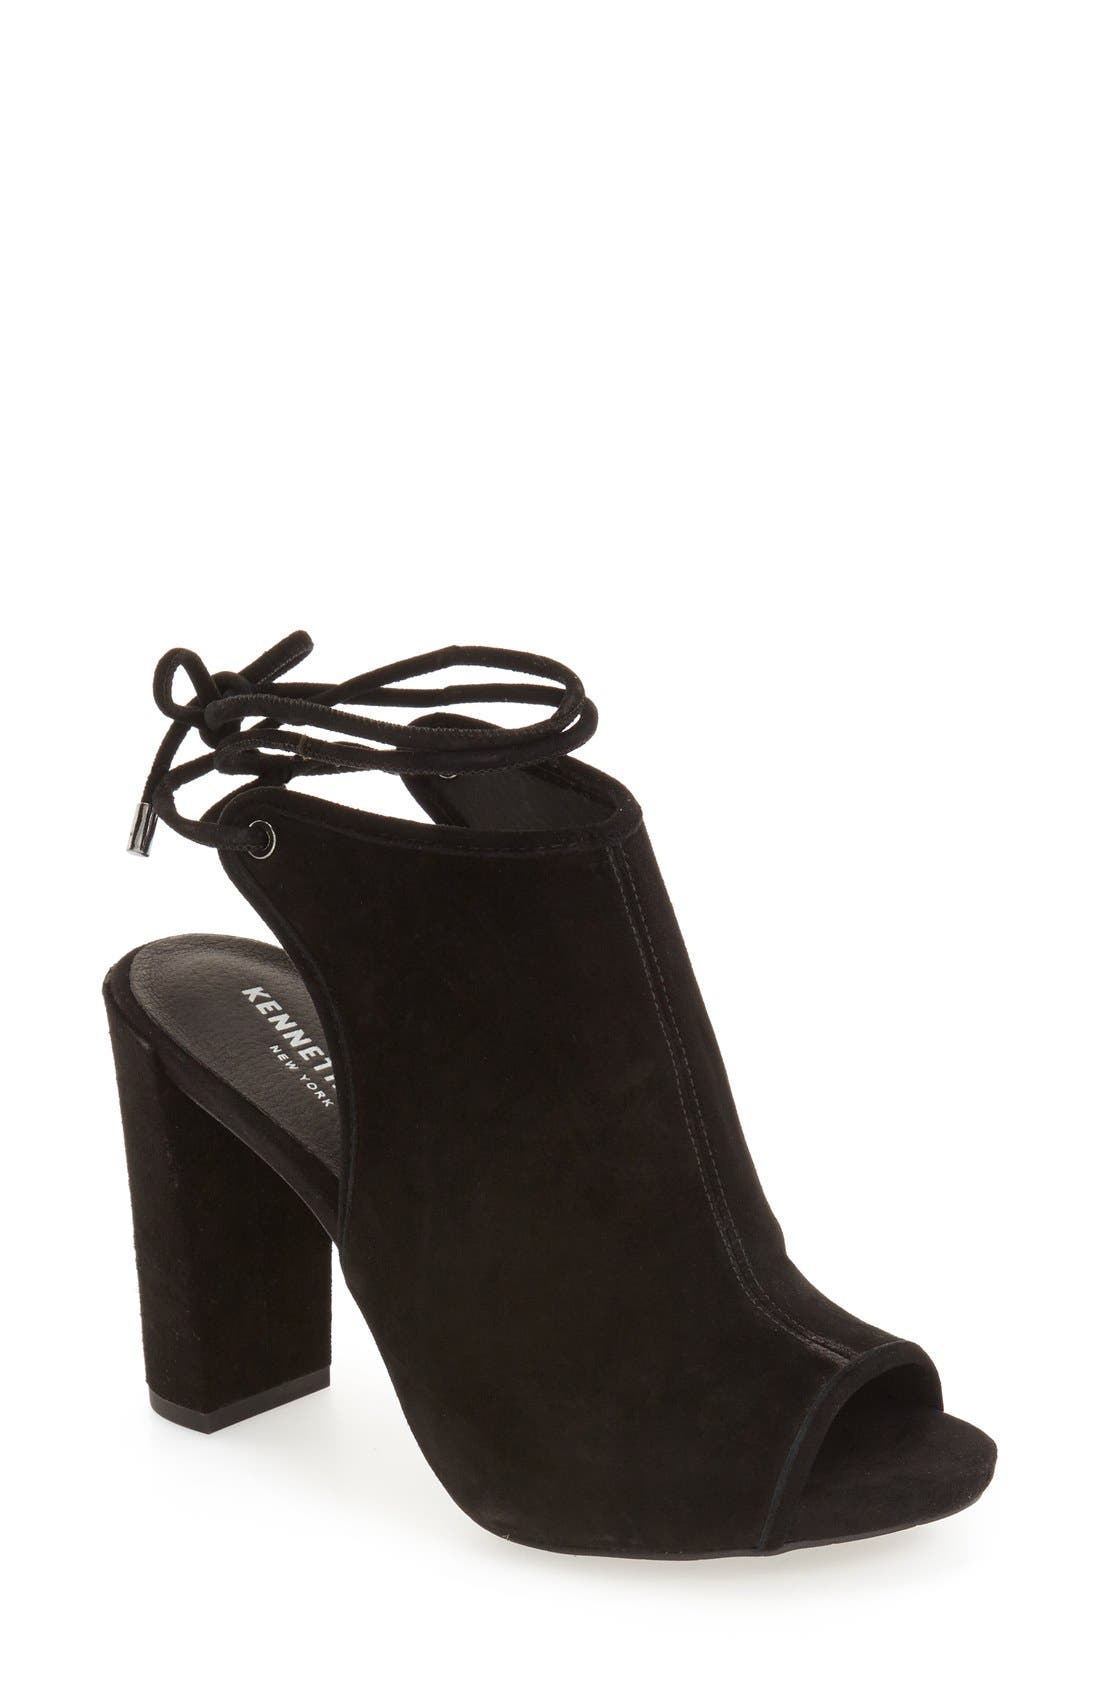 Main Image - Kenneth Cole New York Darla Block Heel Sandal (Women)